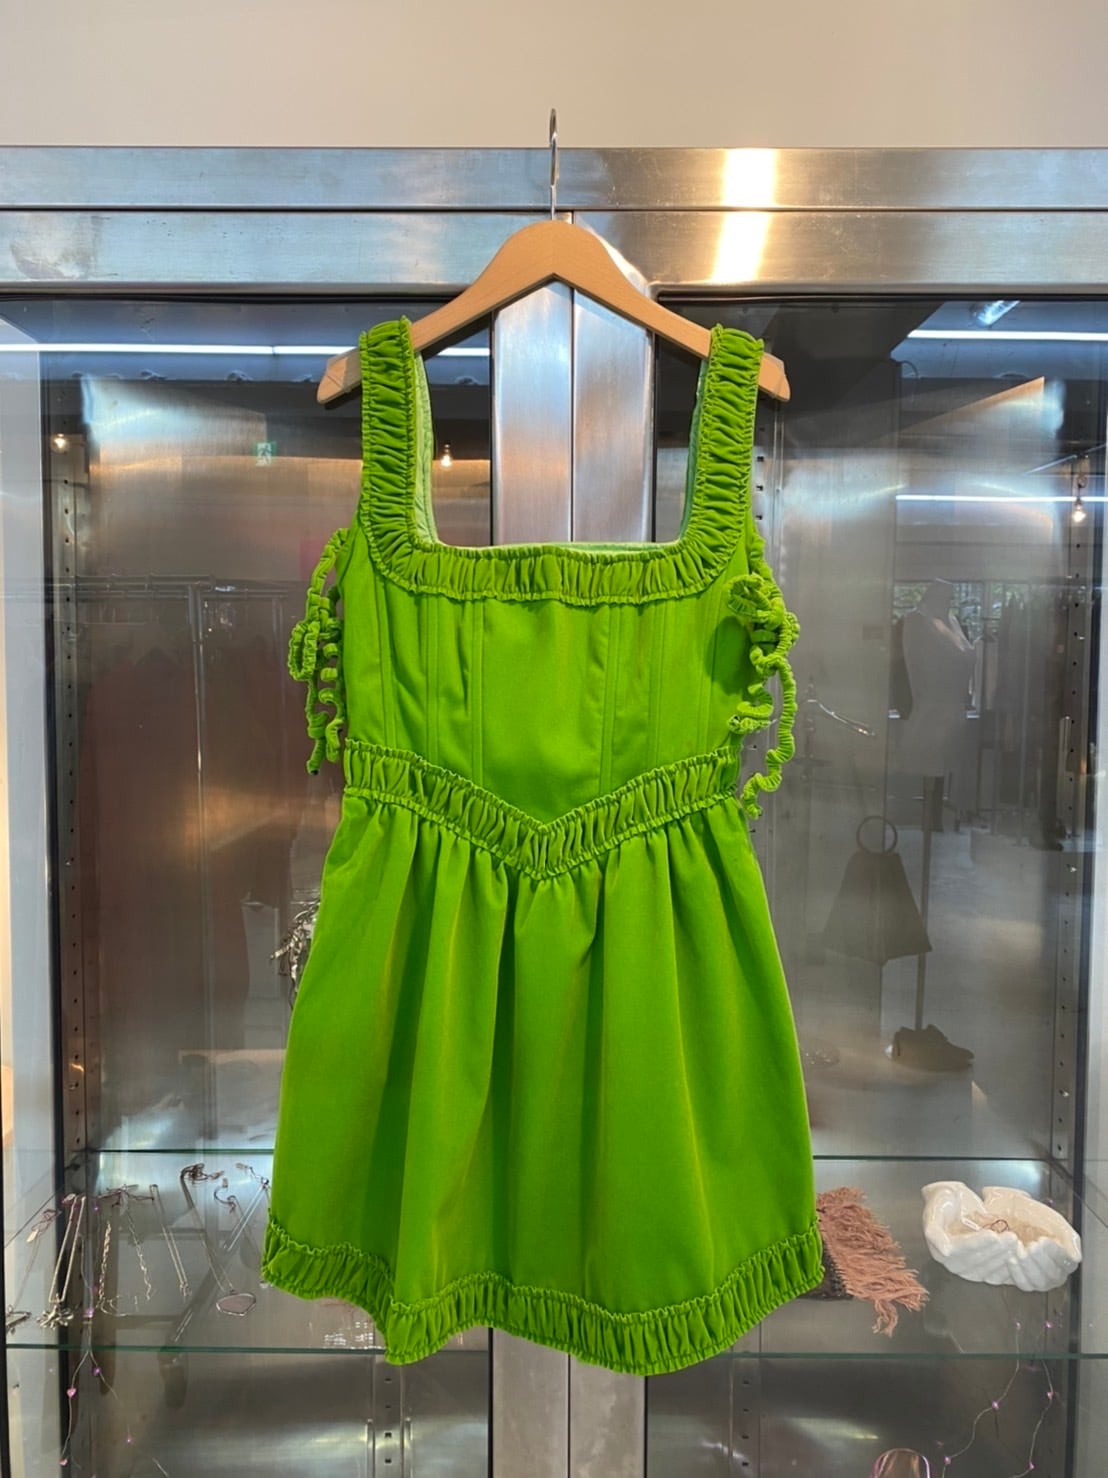 New dress(NO DRESS)